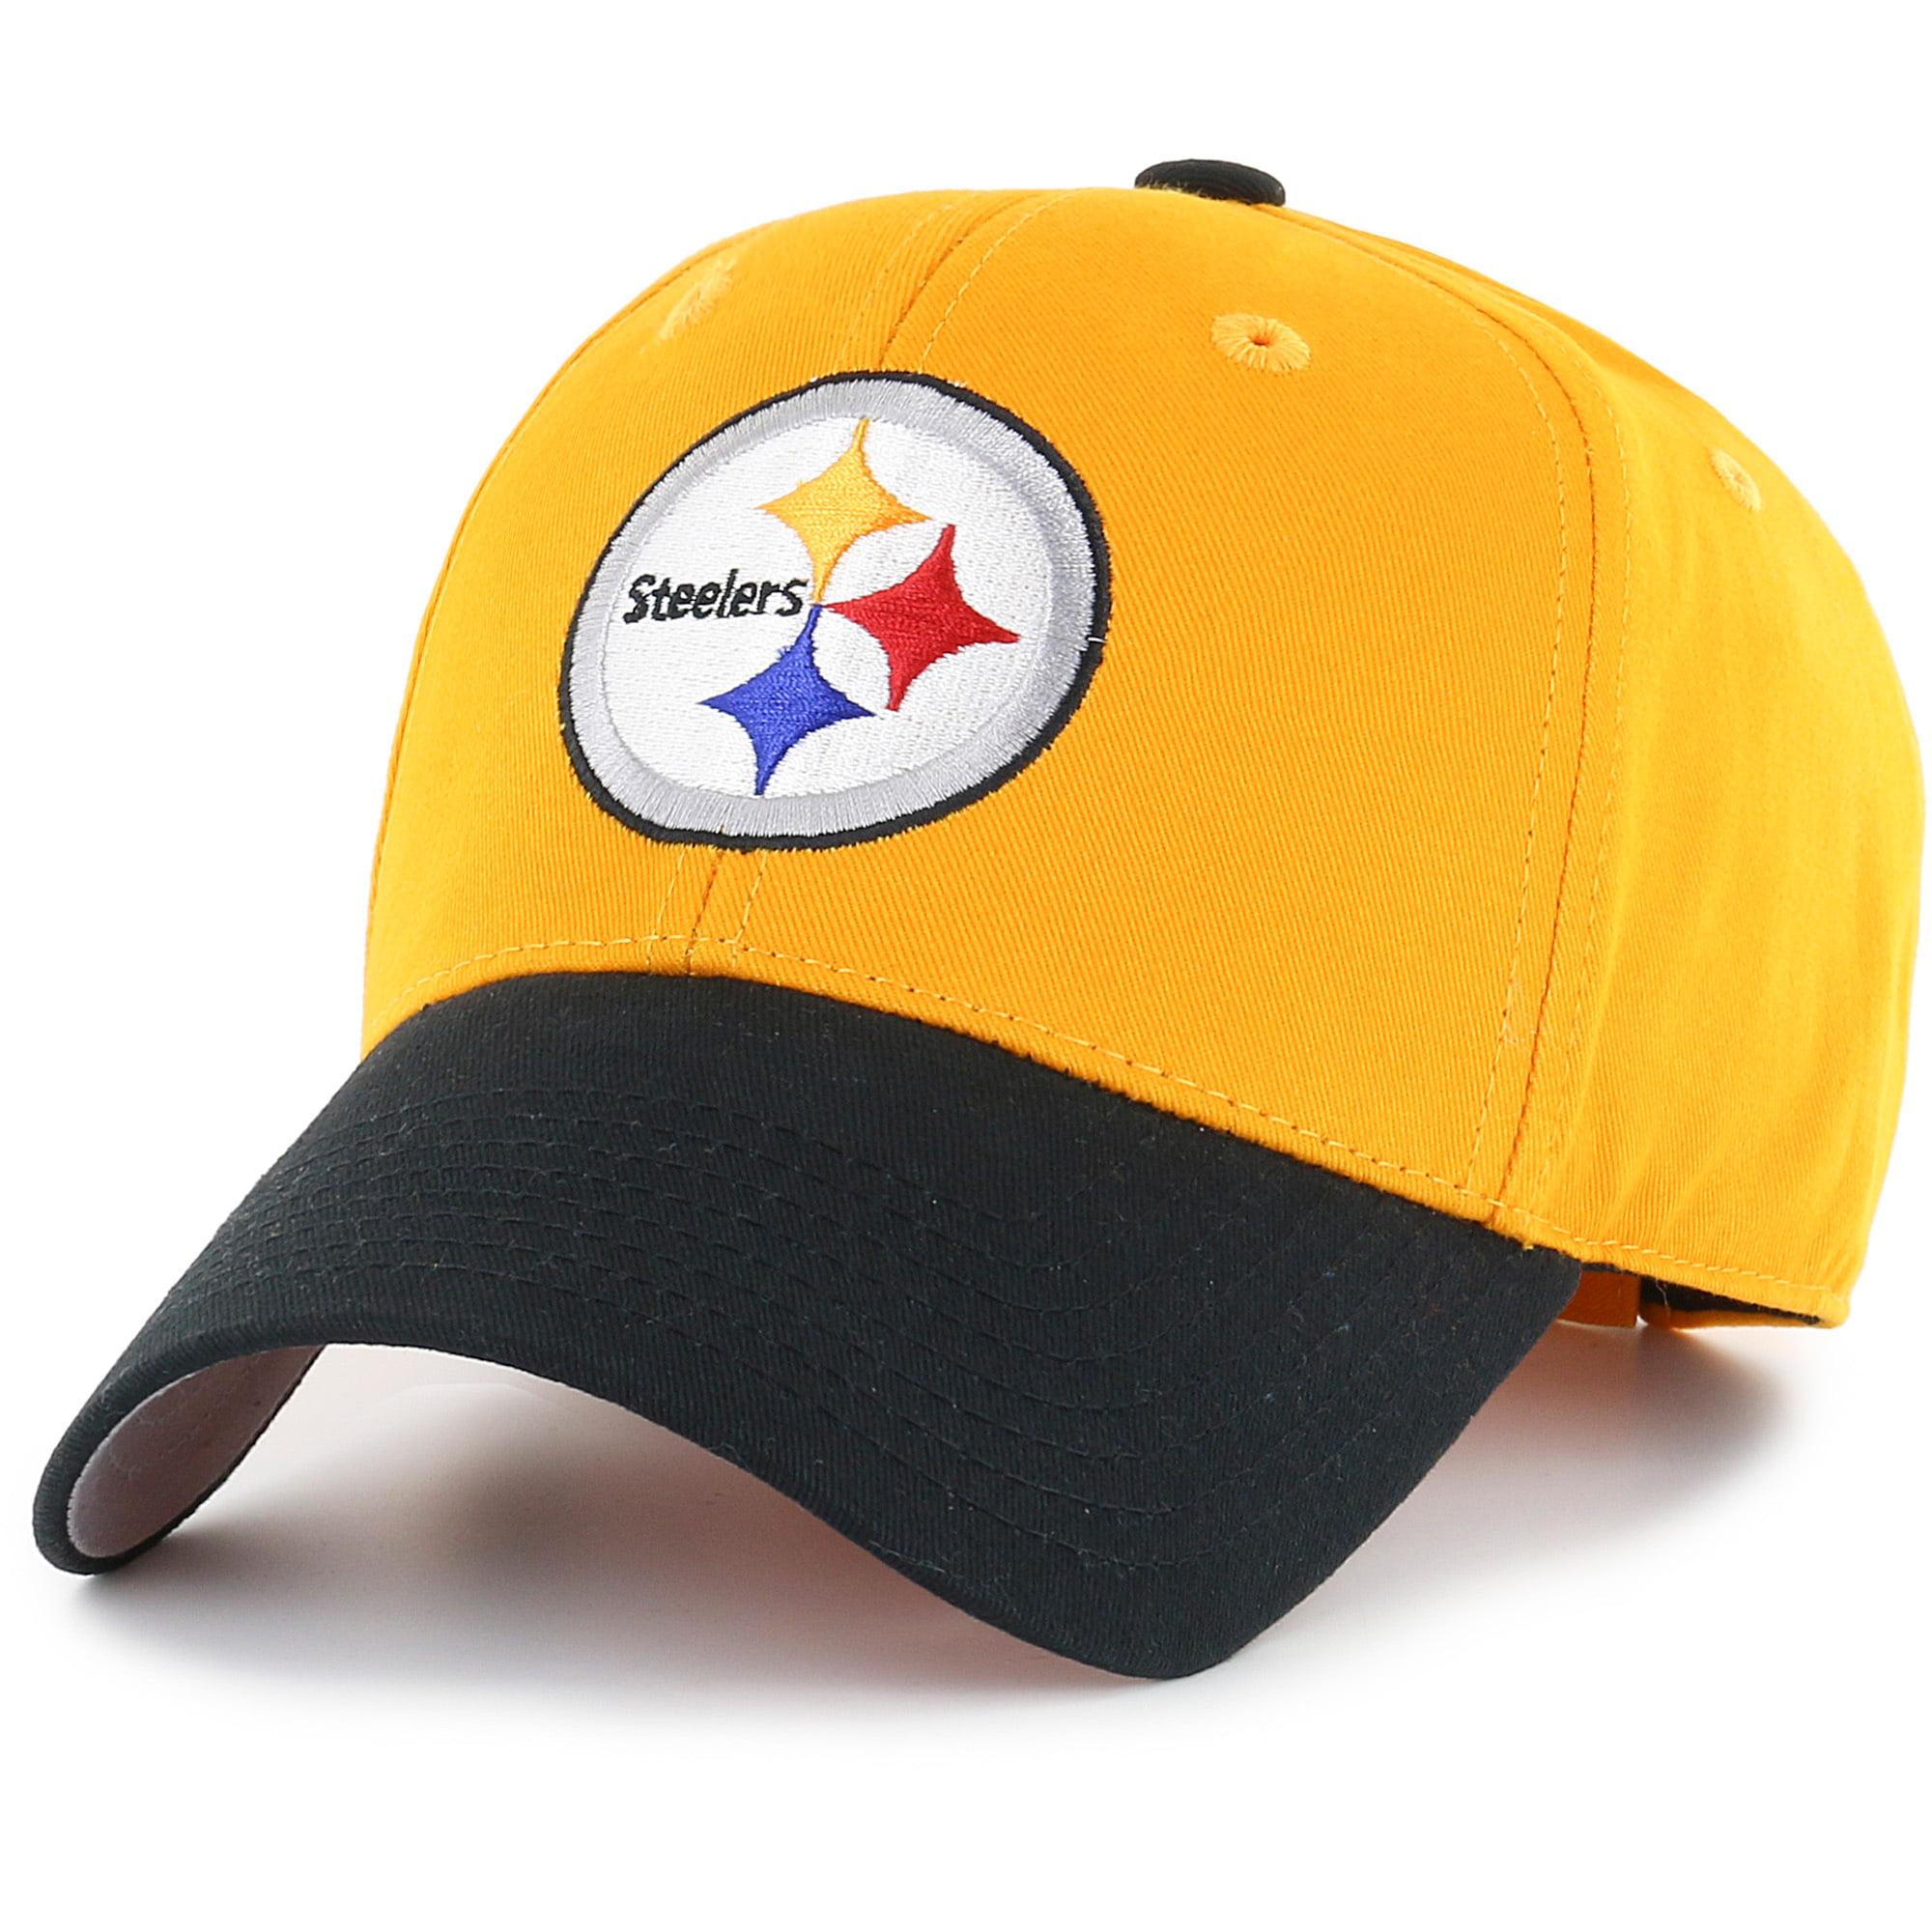 Men's Fan Favorite Gold/Black Pittsburgh Steelers Two-Tone Adjustable Hat - OSFA